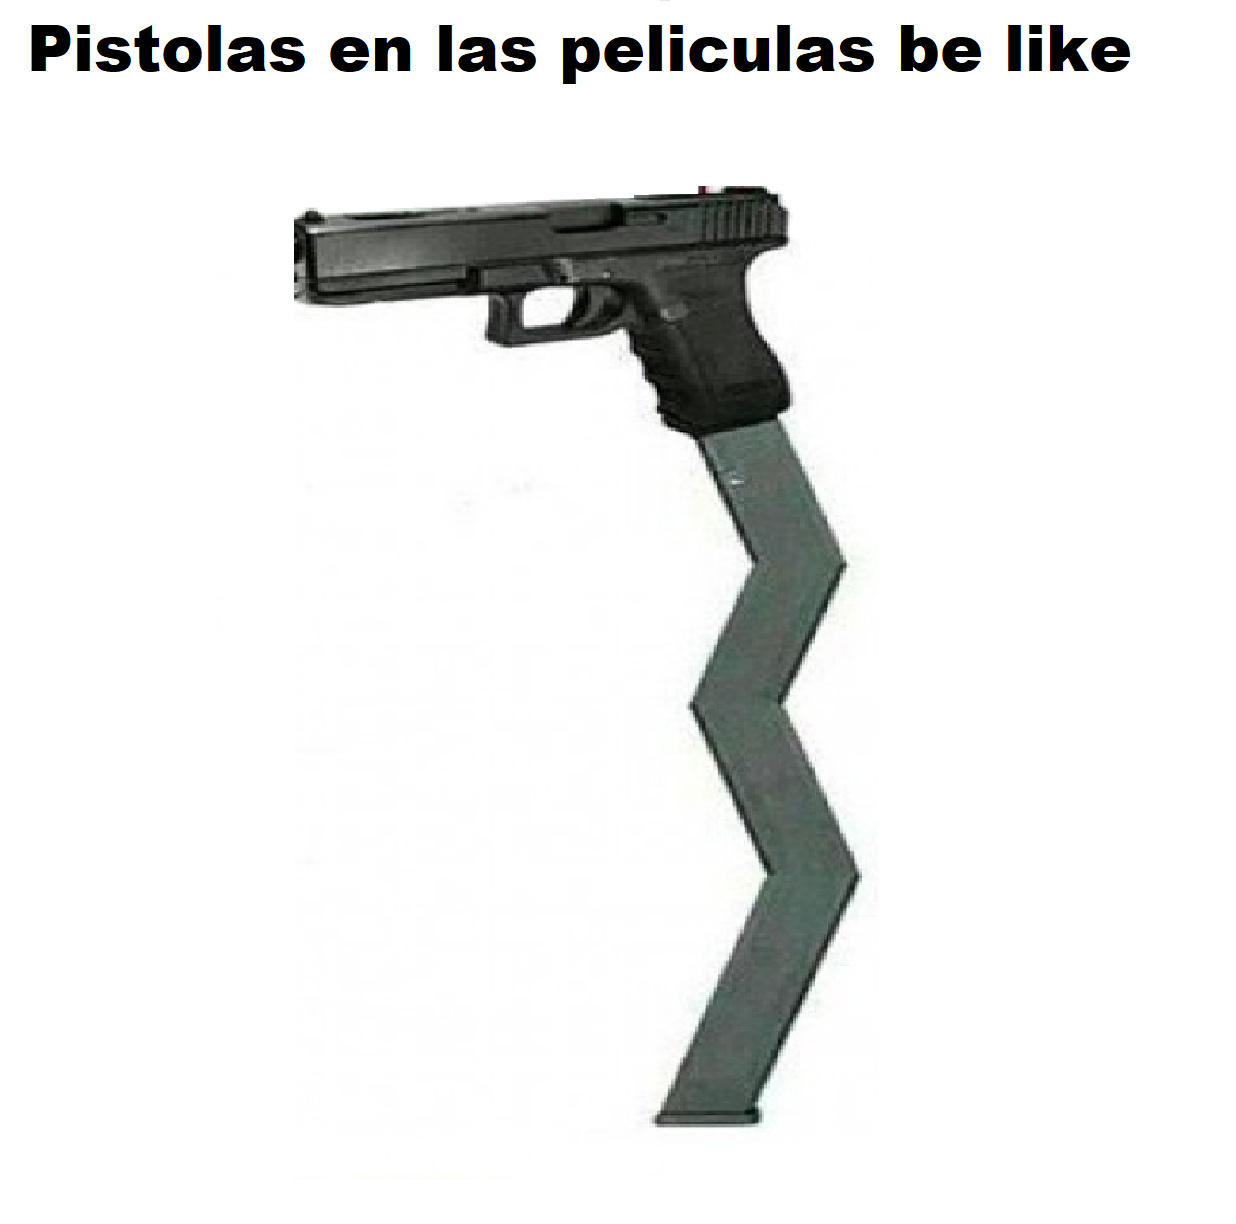 pistolas en películas be like - meme